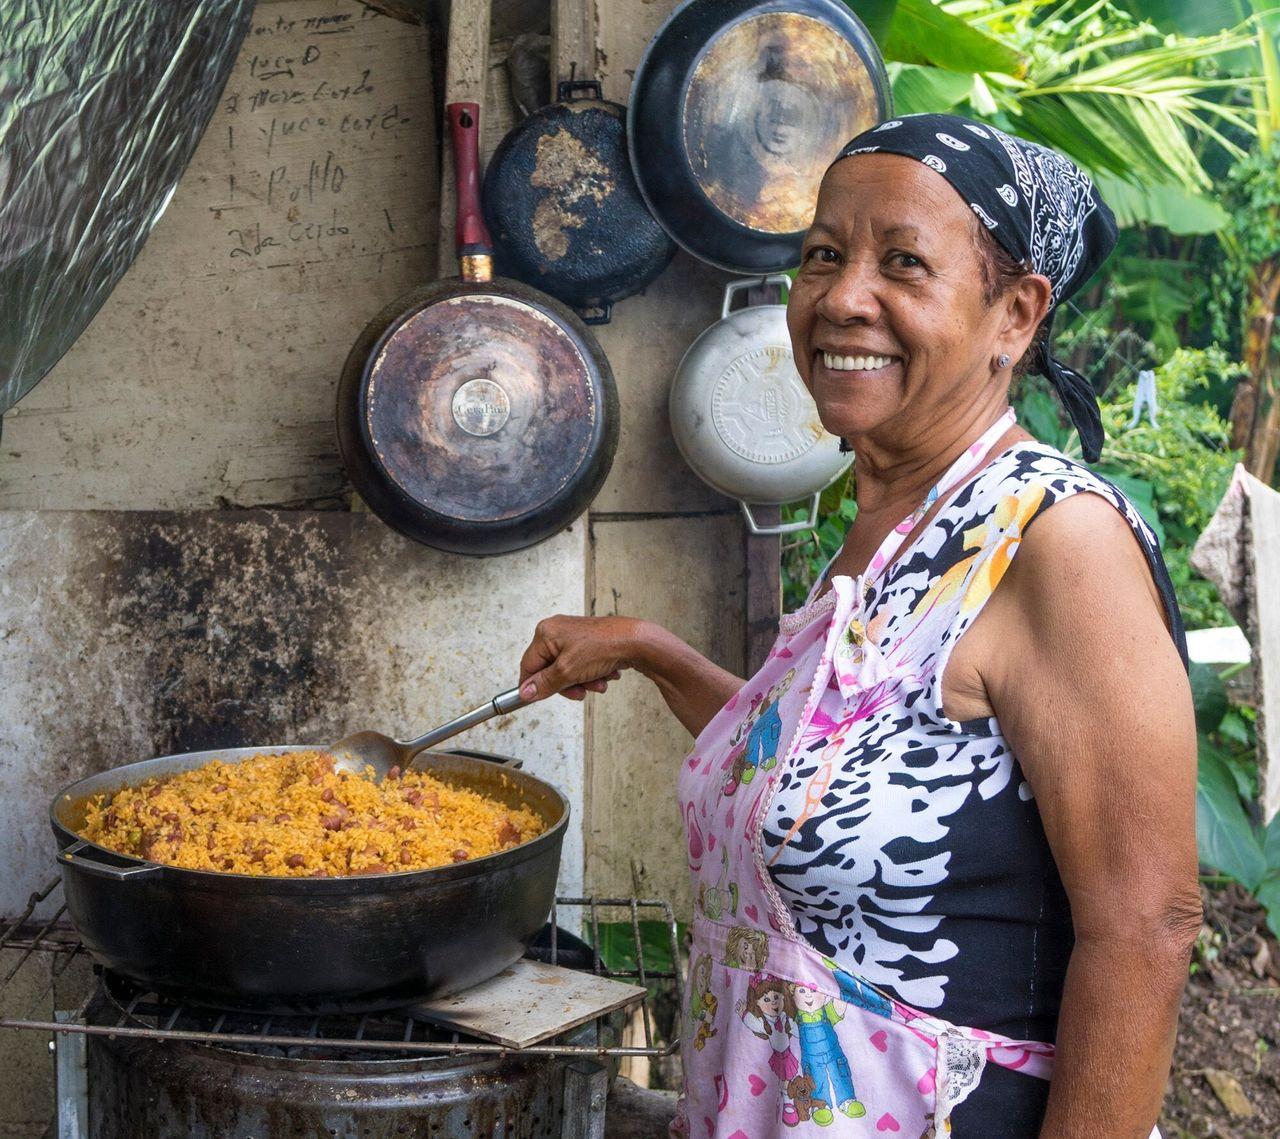 Adelaida Montañez prepares food in her outdoor kitchen